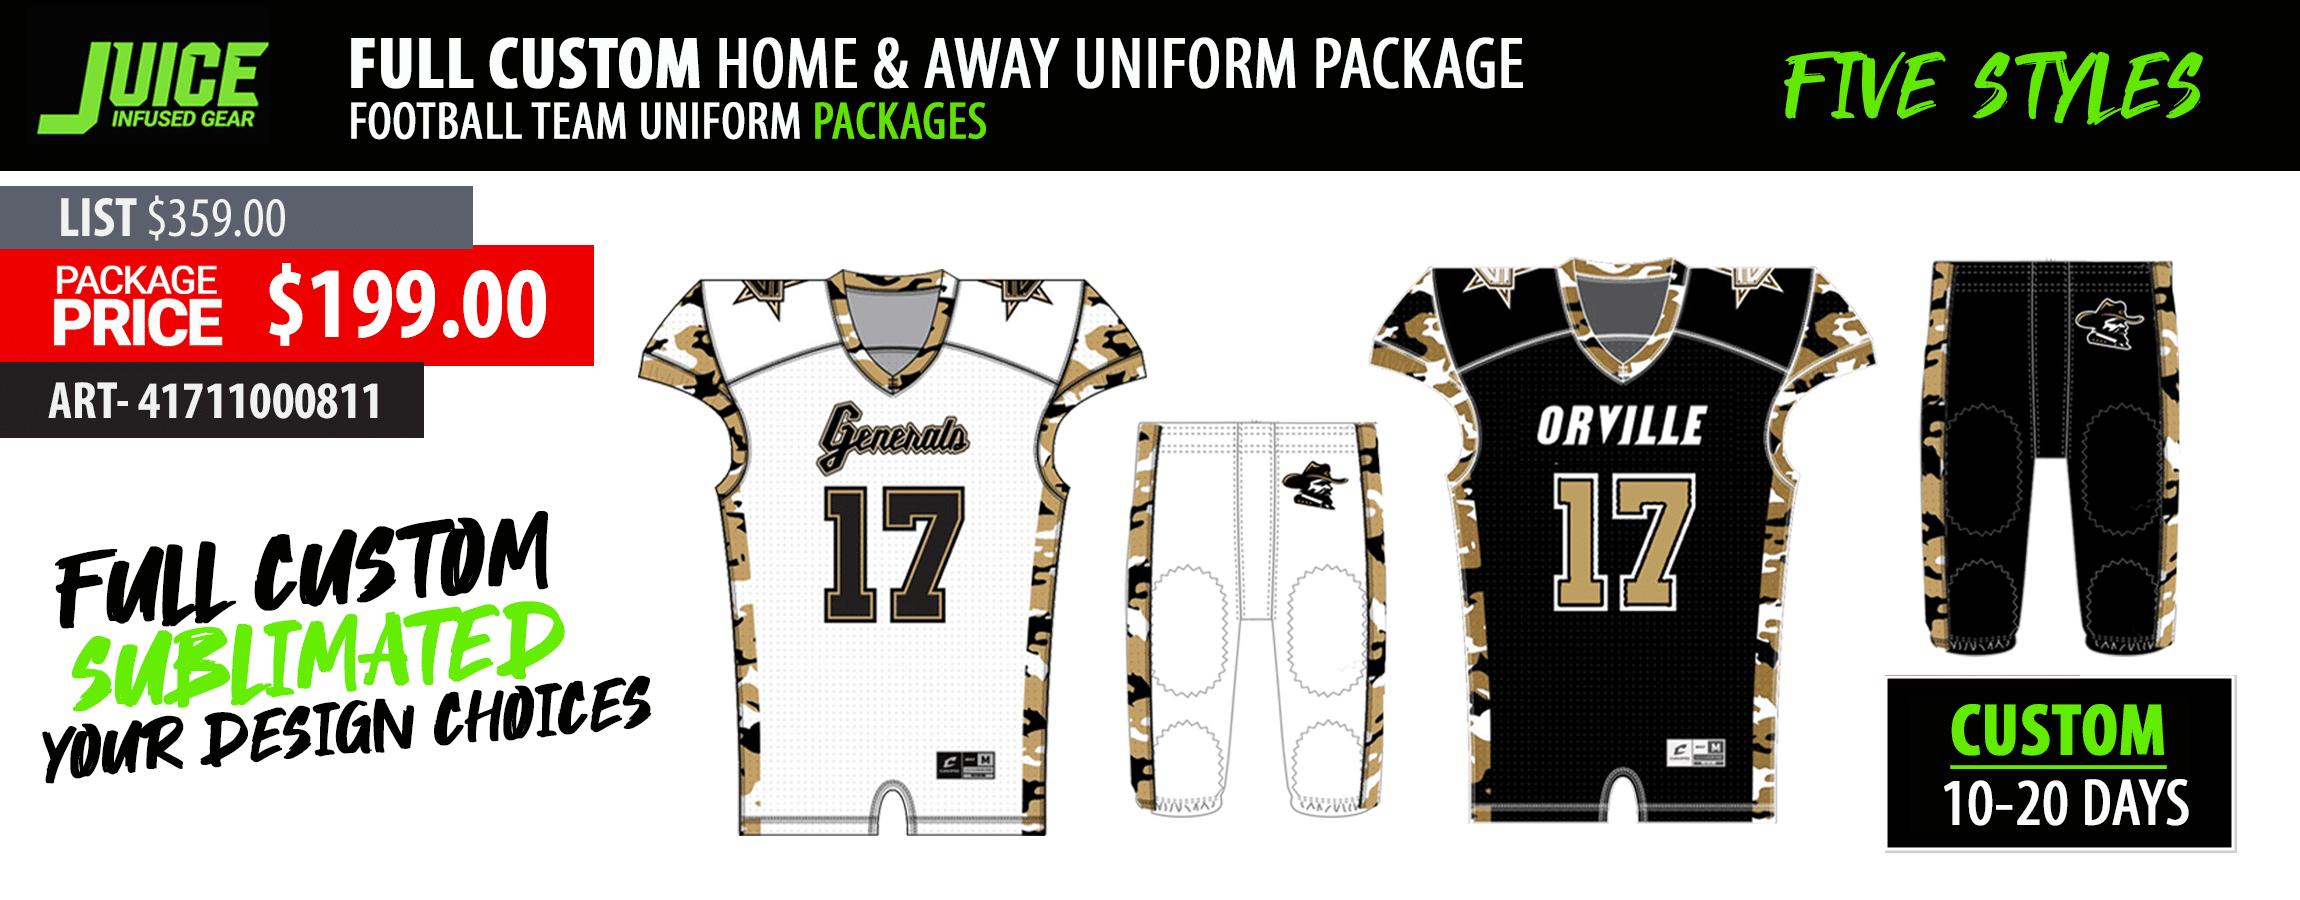 Juice Custom Sublimated Football Team Jersey Uniform Package - ProPlayerTeam